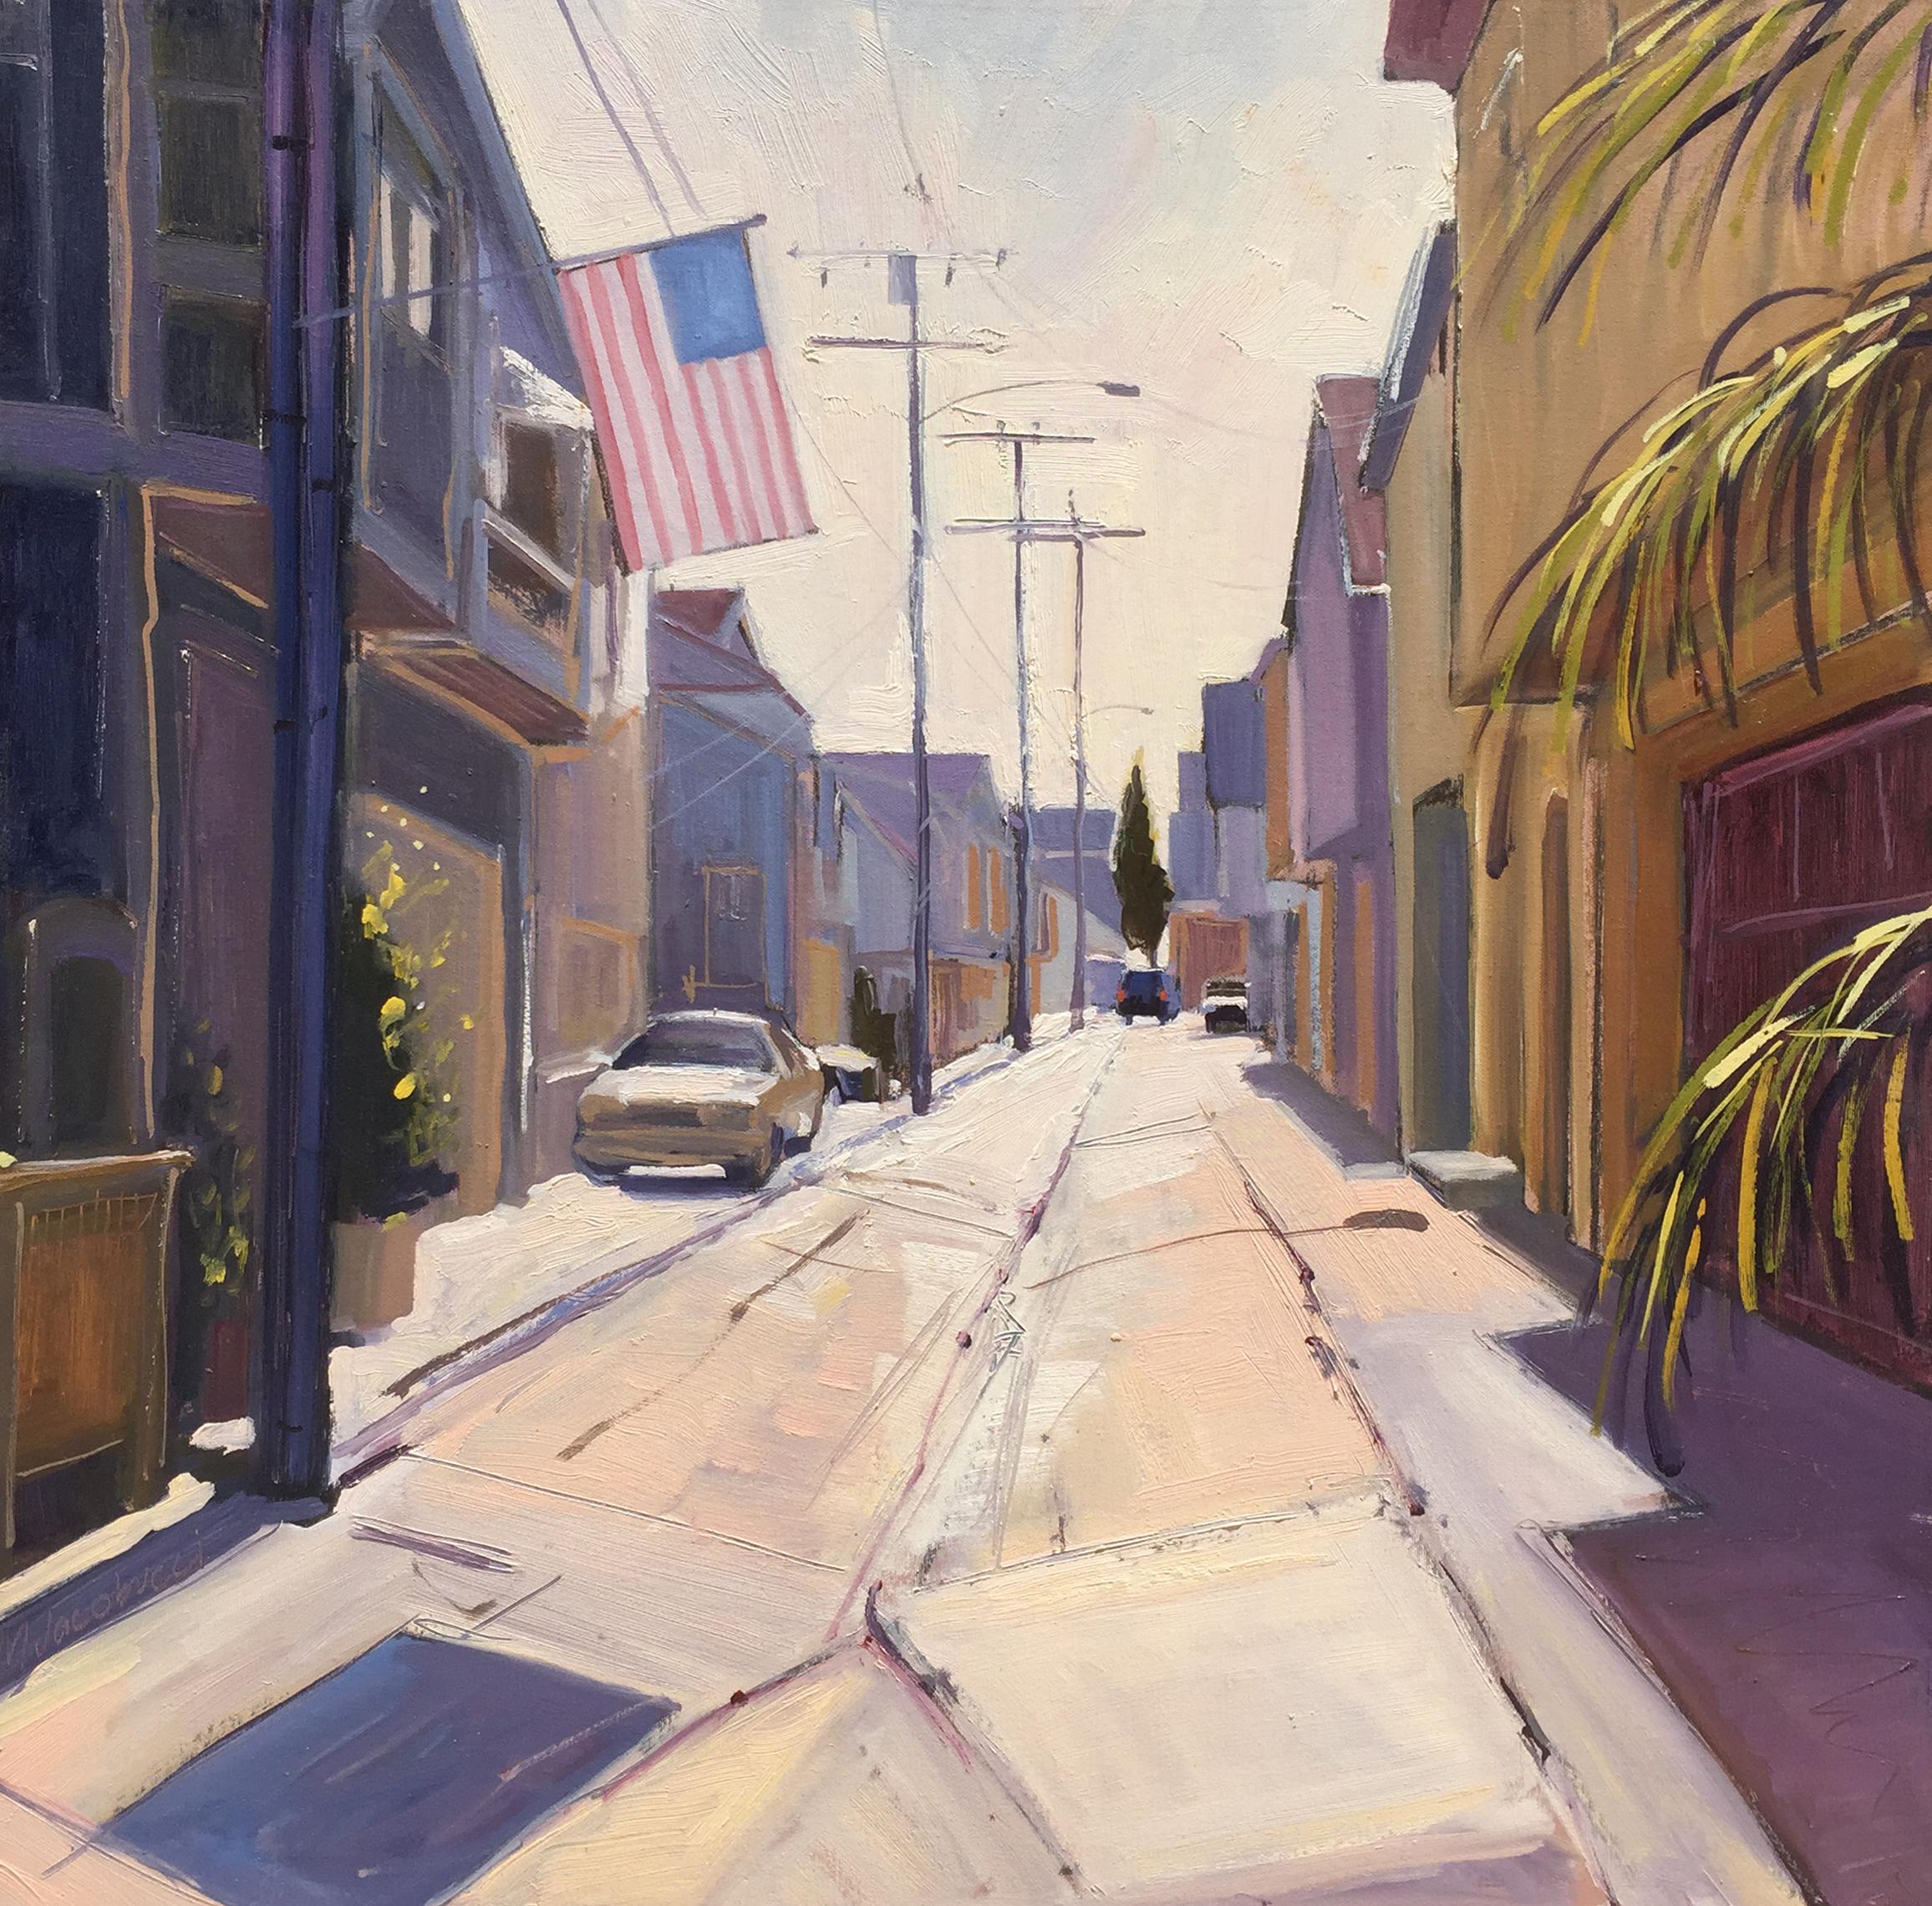 Balboa Alley